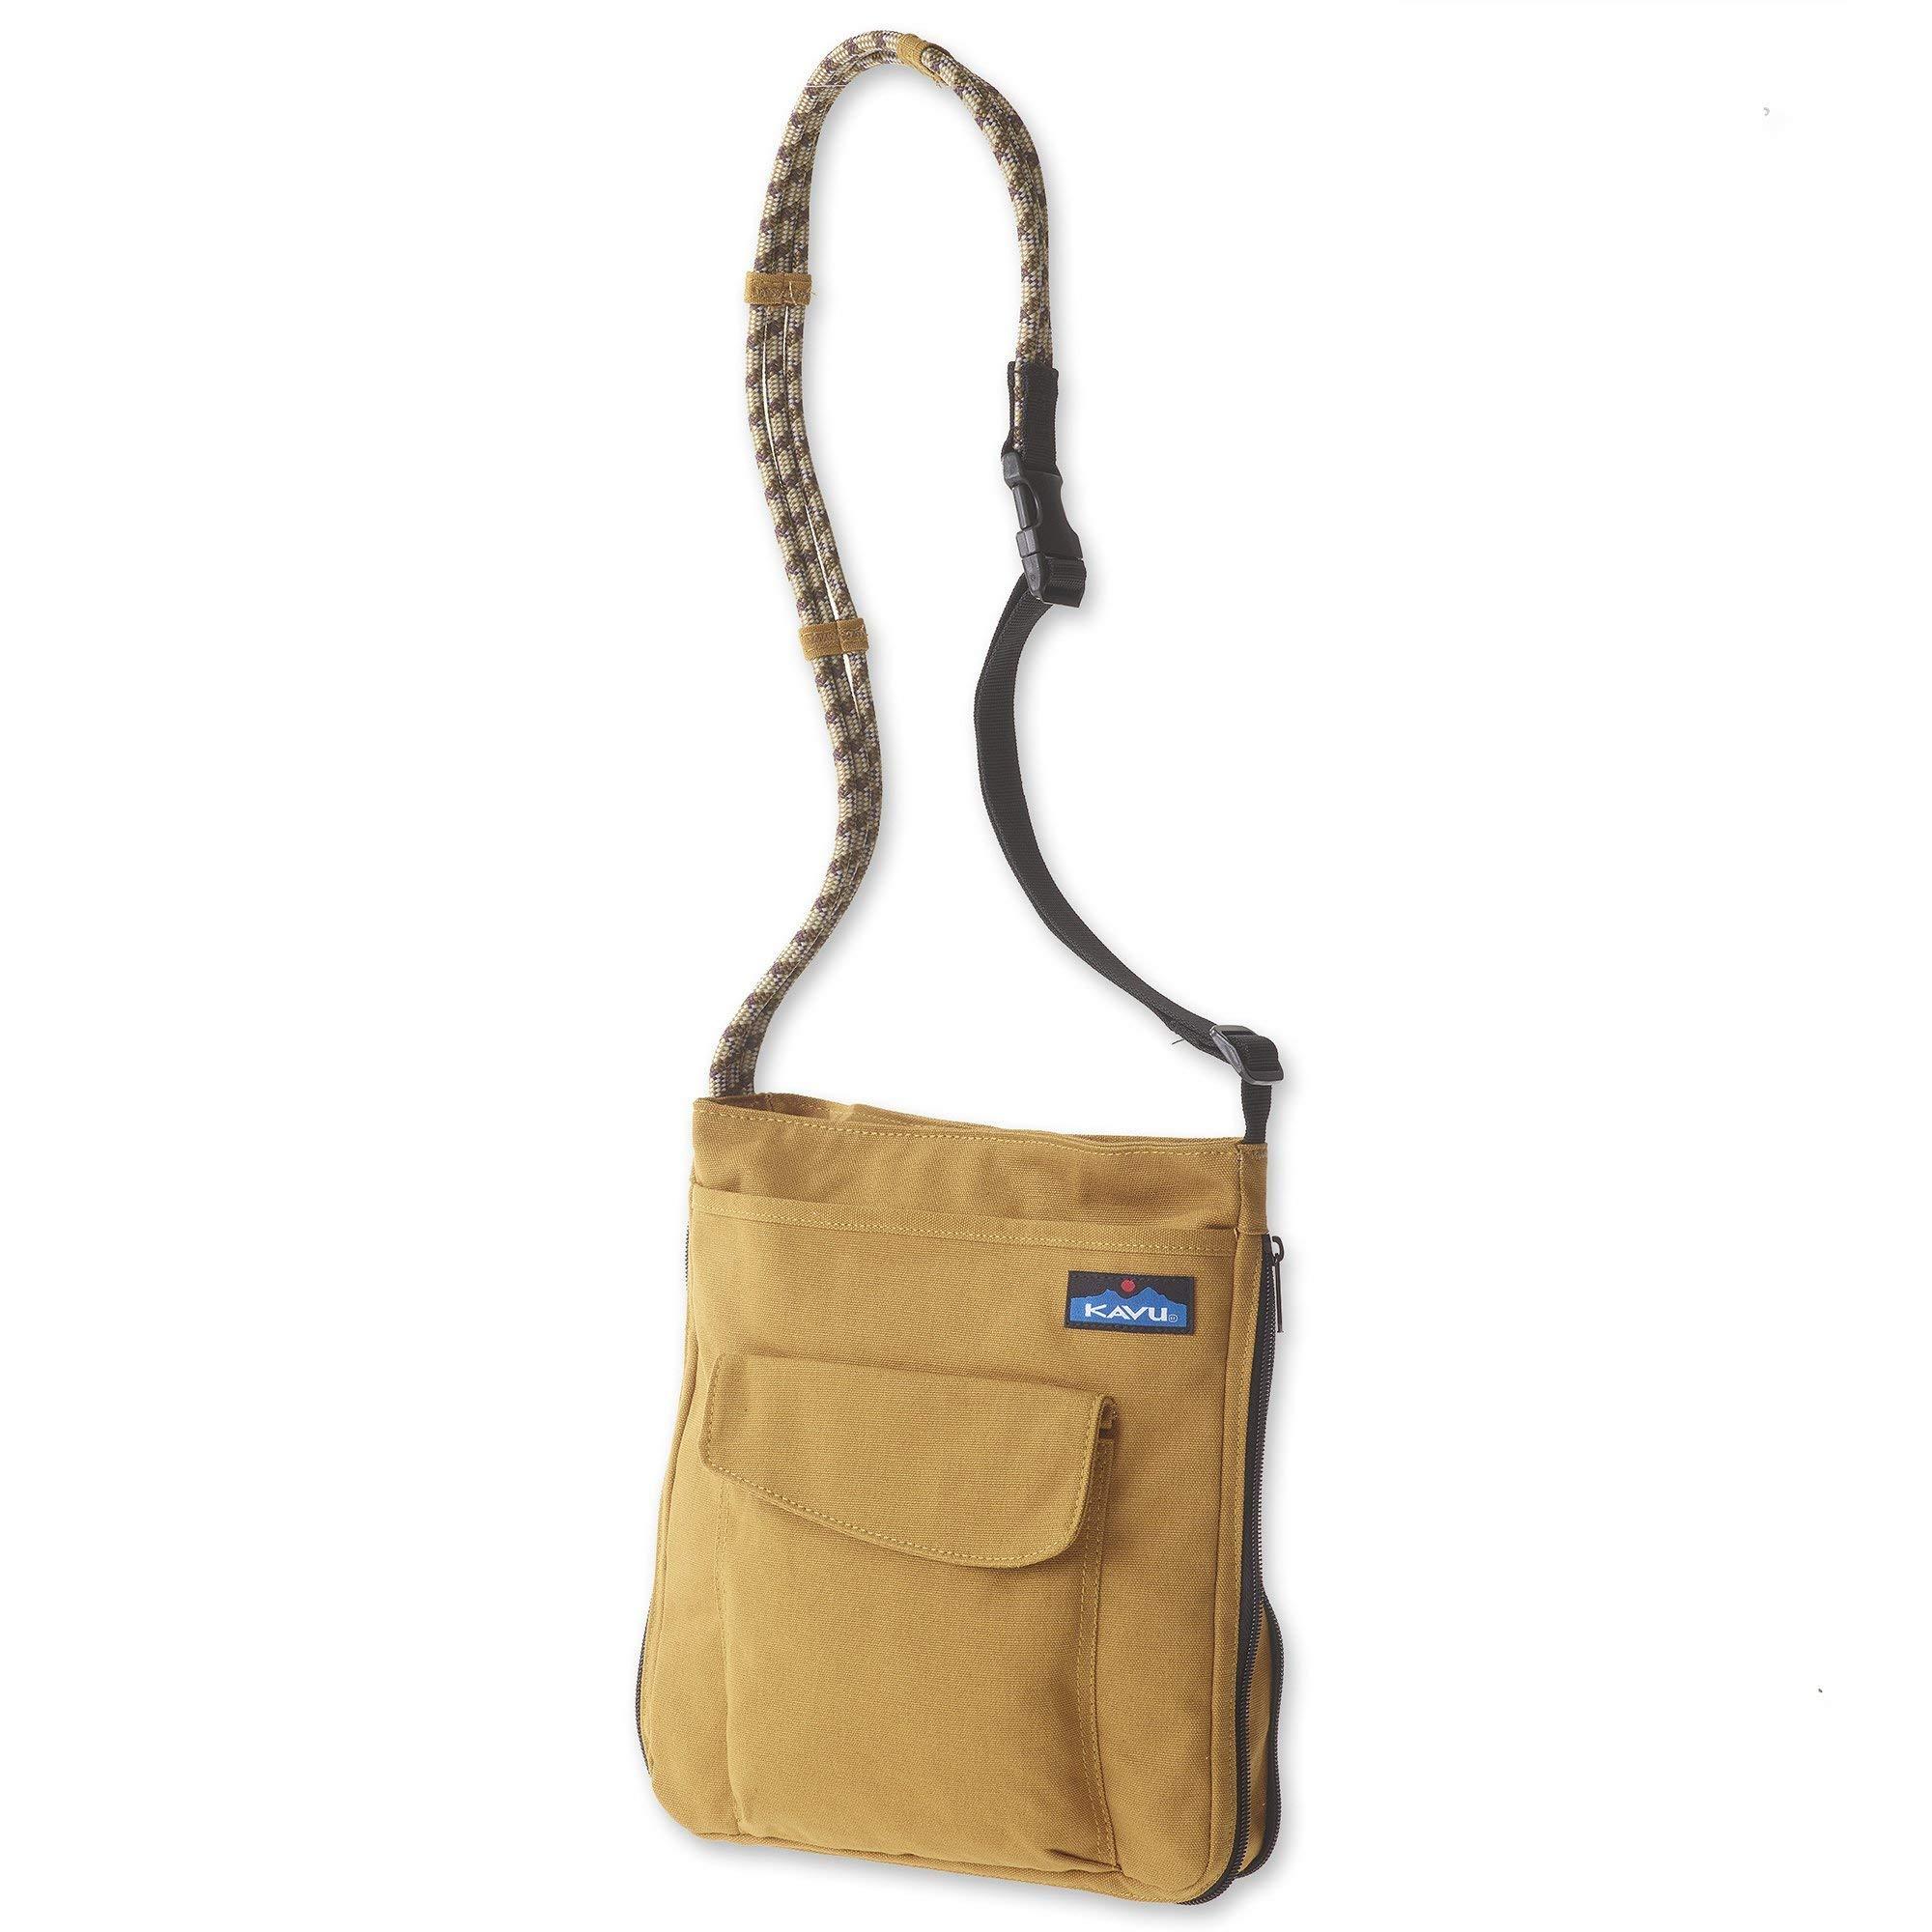 KAVU Sidewinder Crossbody Bag with Adjustable Rope Strap - Tobacco